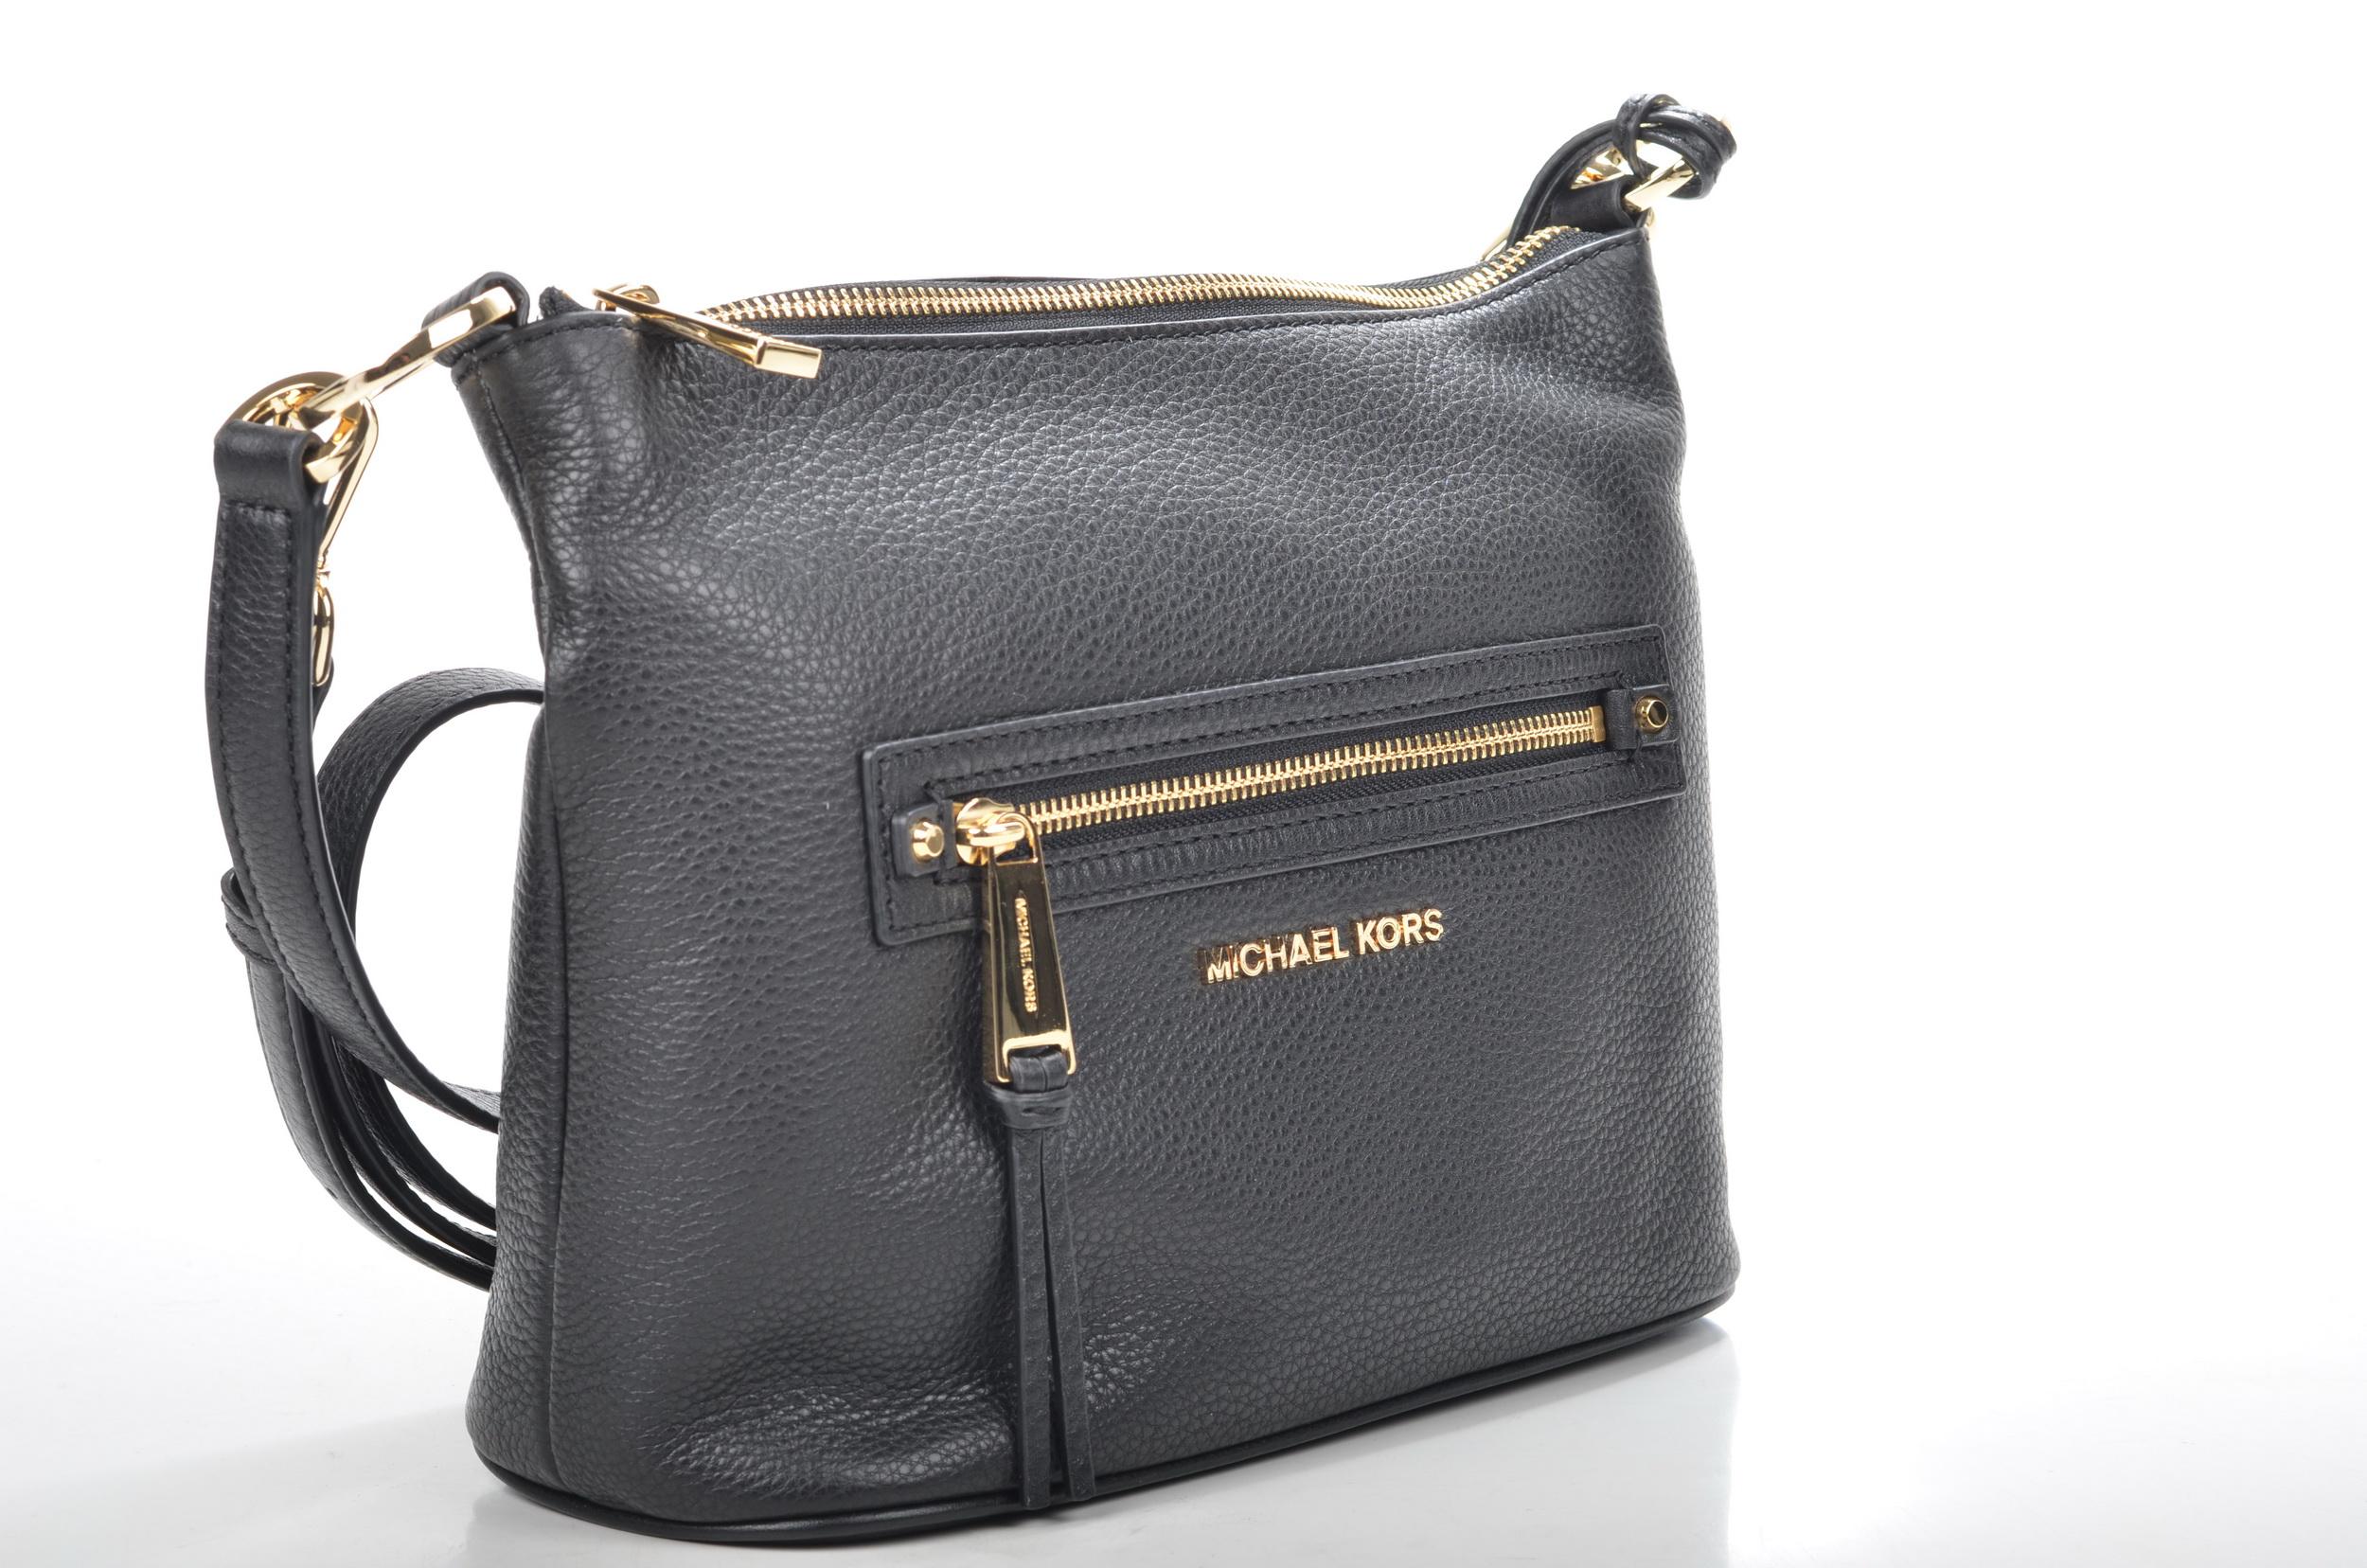 description michael kors rhea zip crossbody handtasche 30s5gezl2l. Black Bedroom Furniture Sets. Home Design Ideas